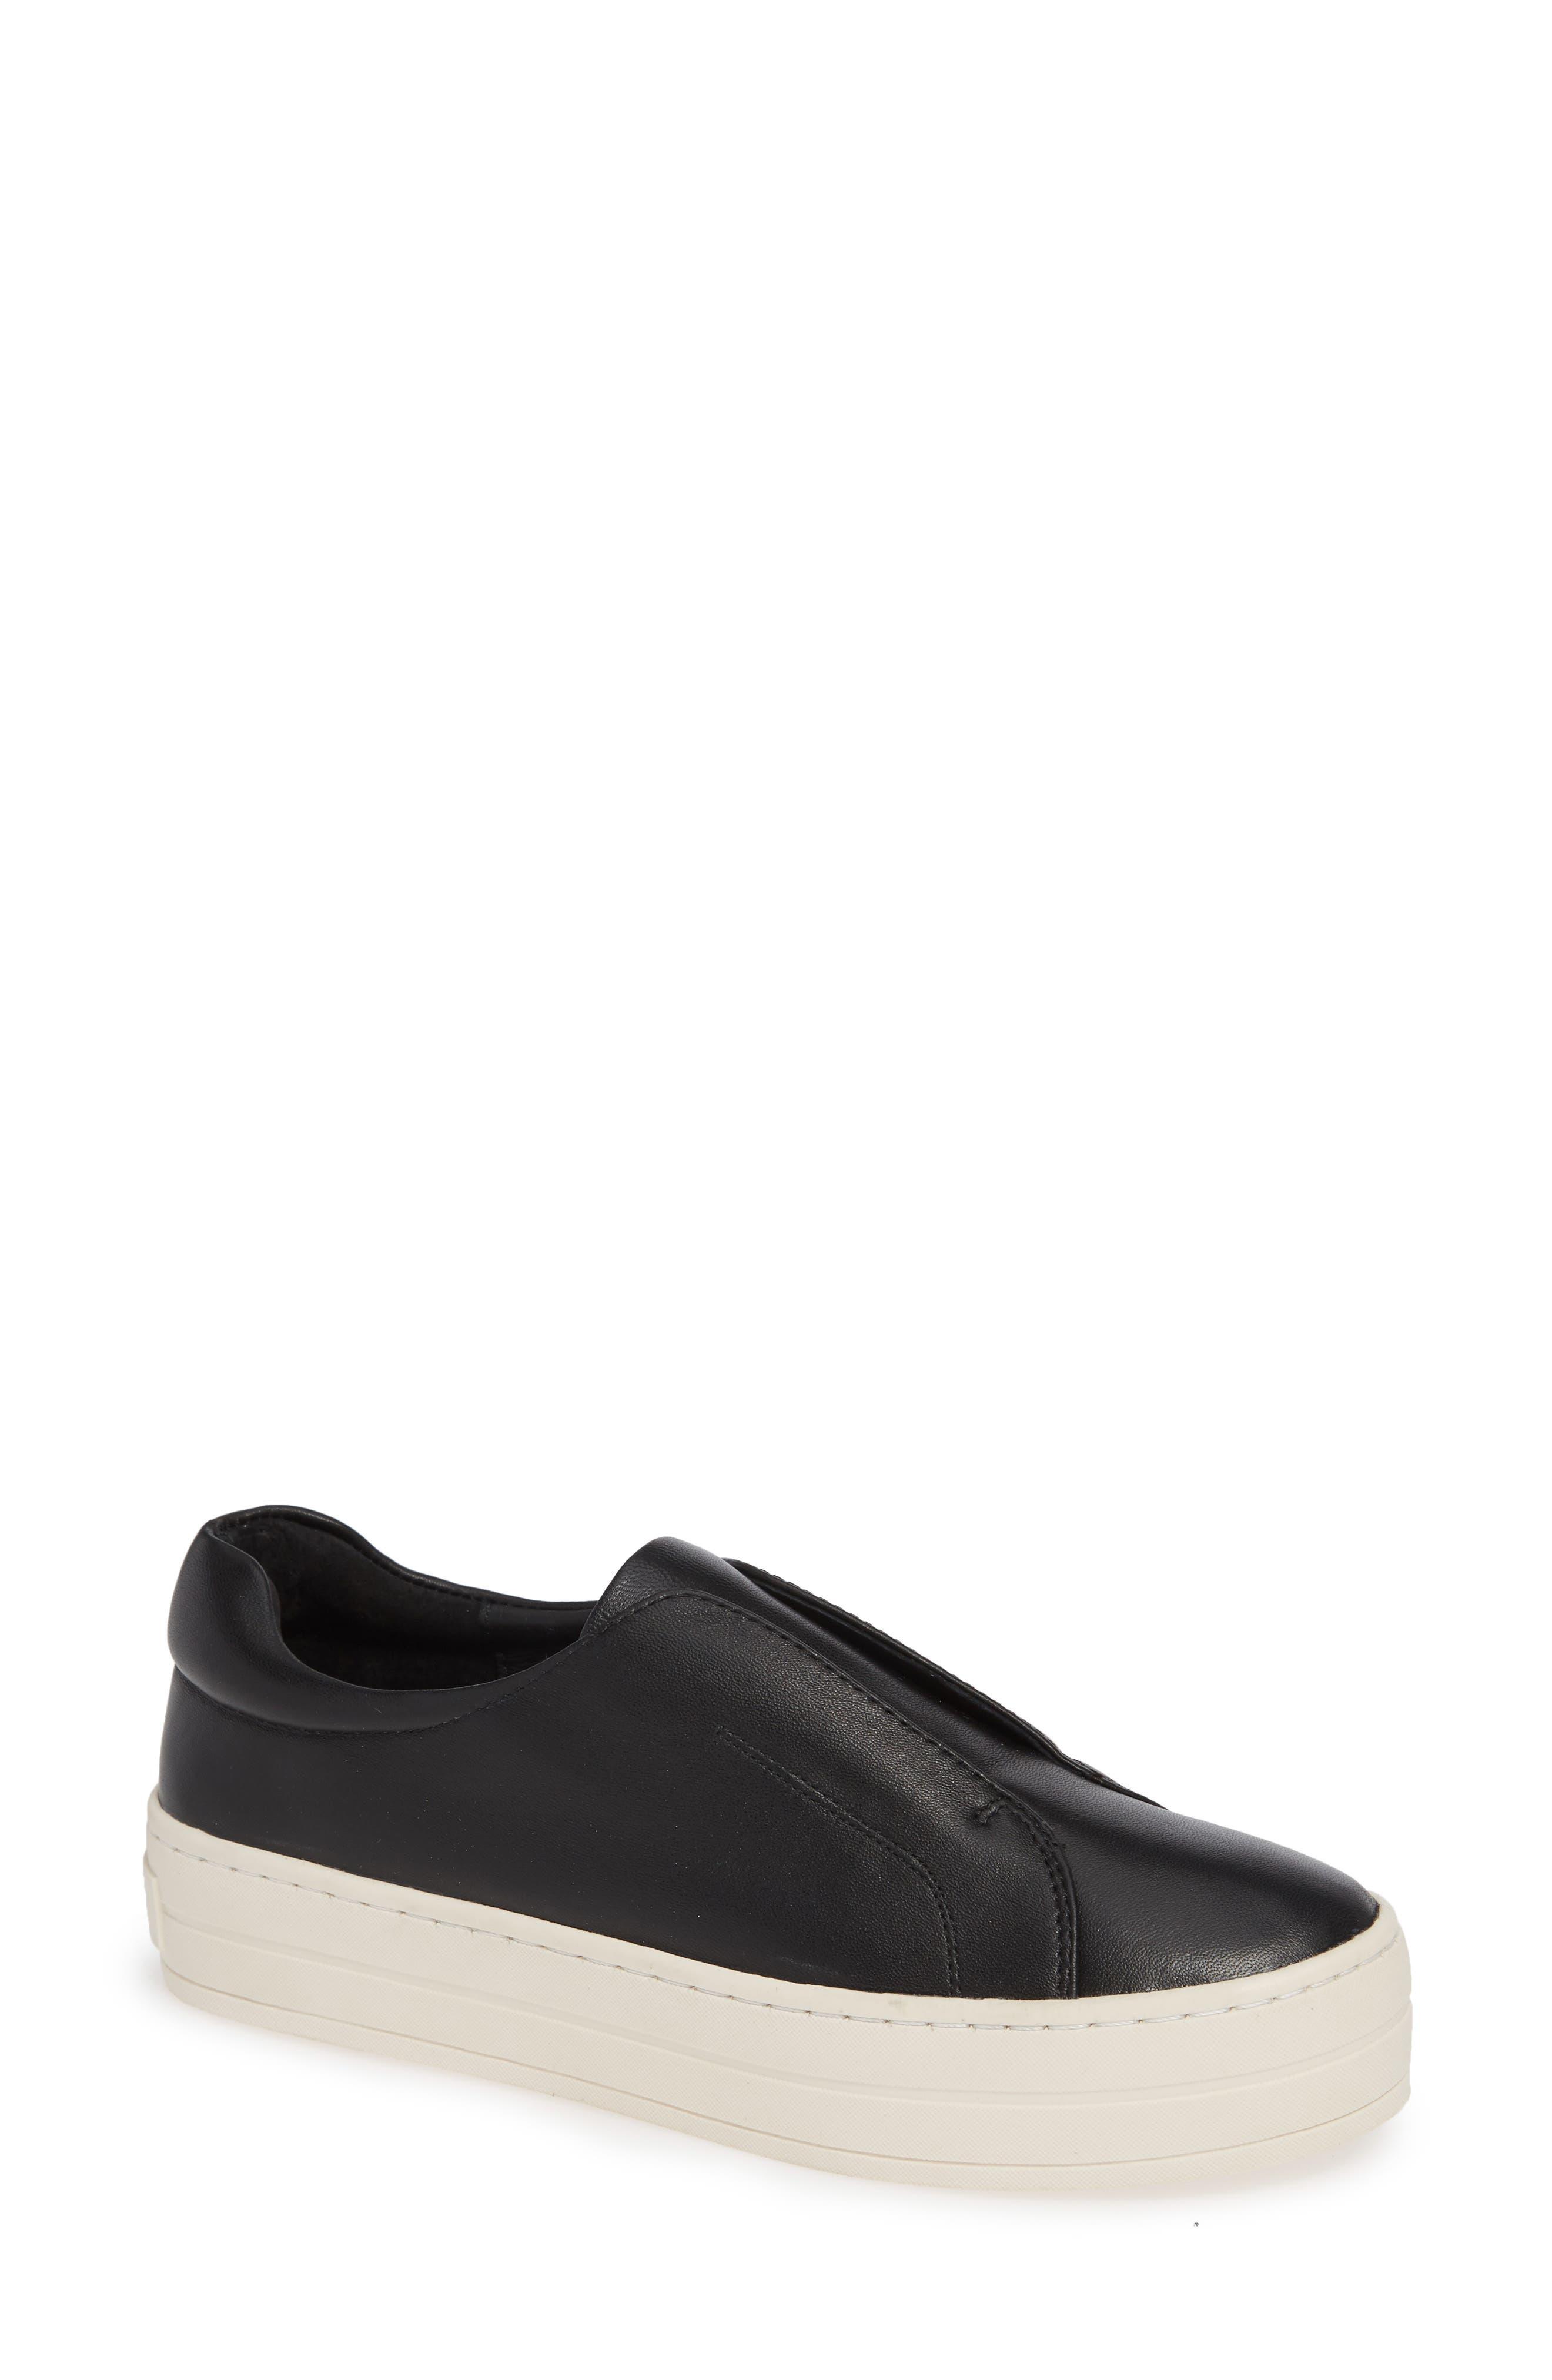 JSLIDES,                             Heidi Platform Slip-On Sneaker,                             Main thumbnail 1, color,                             BLACK LEATHER